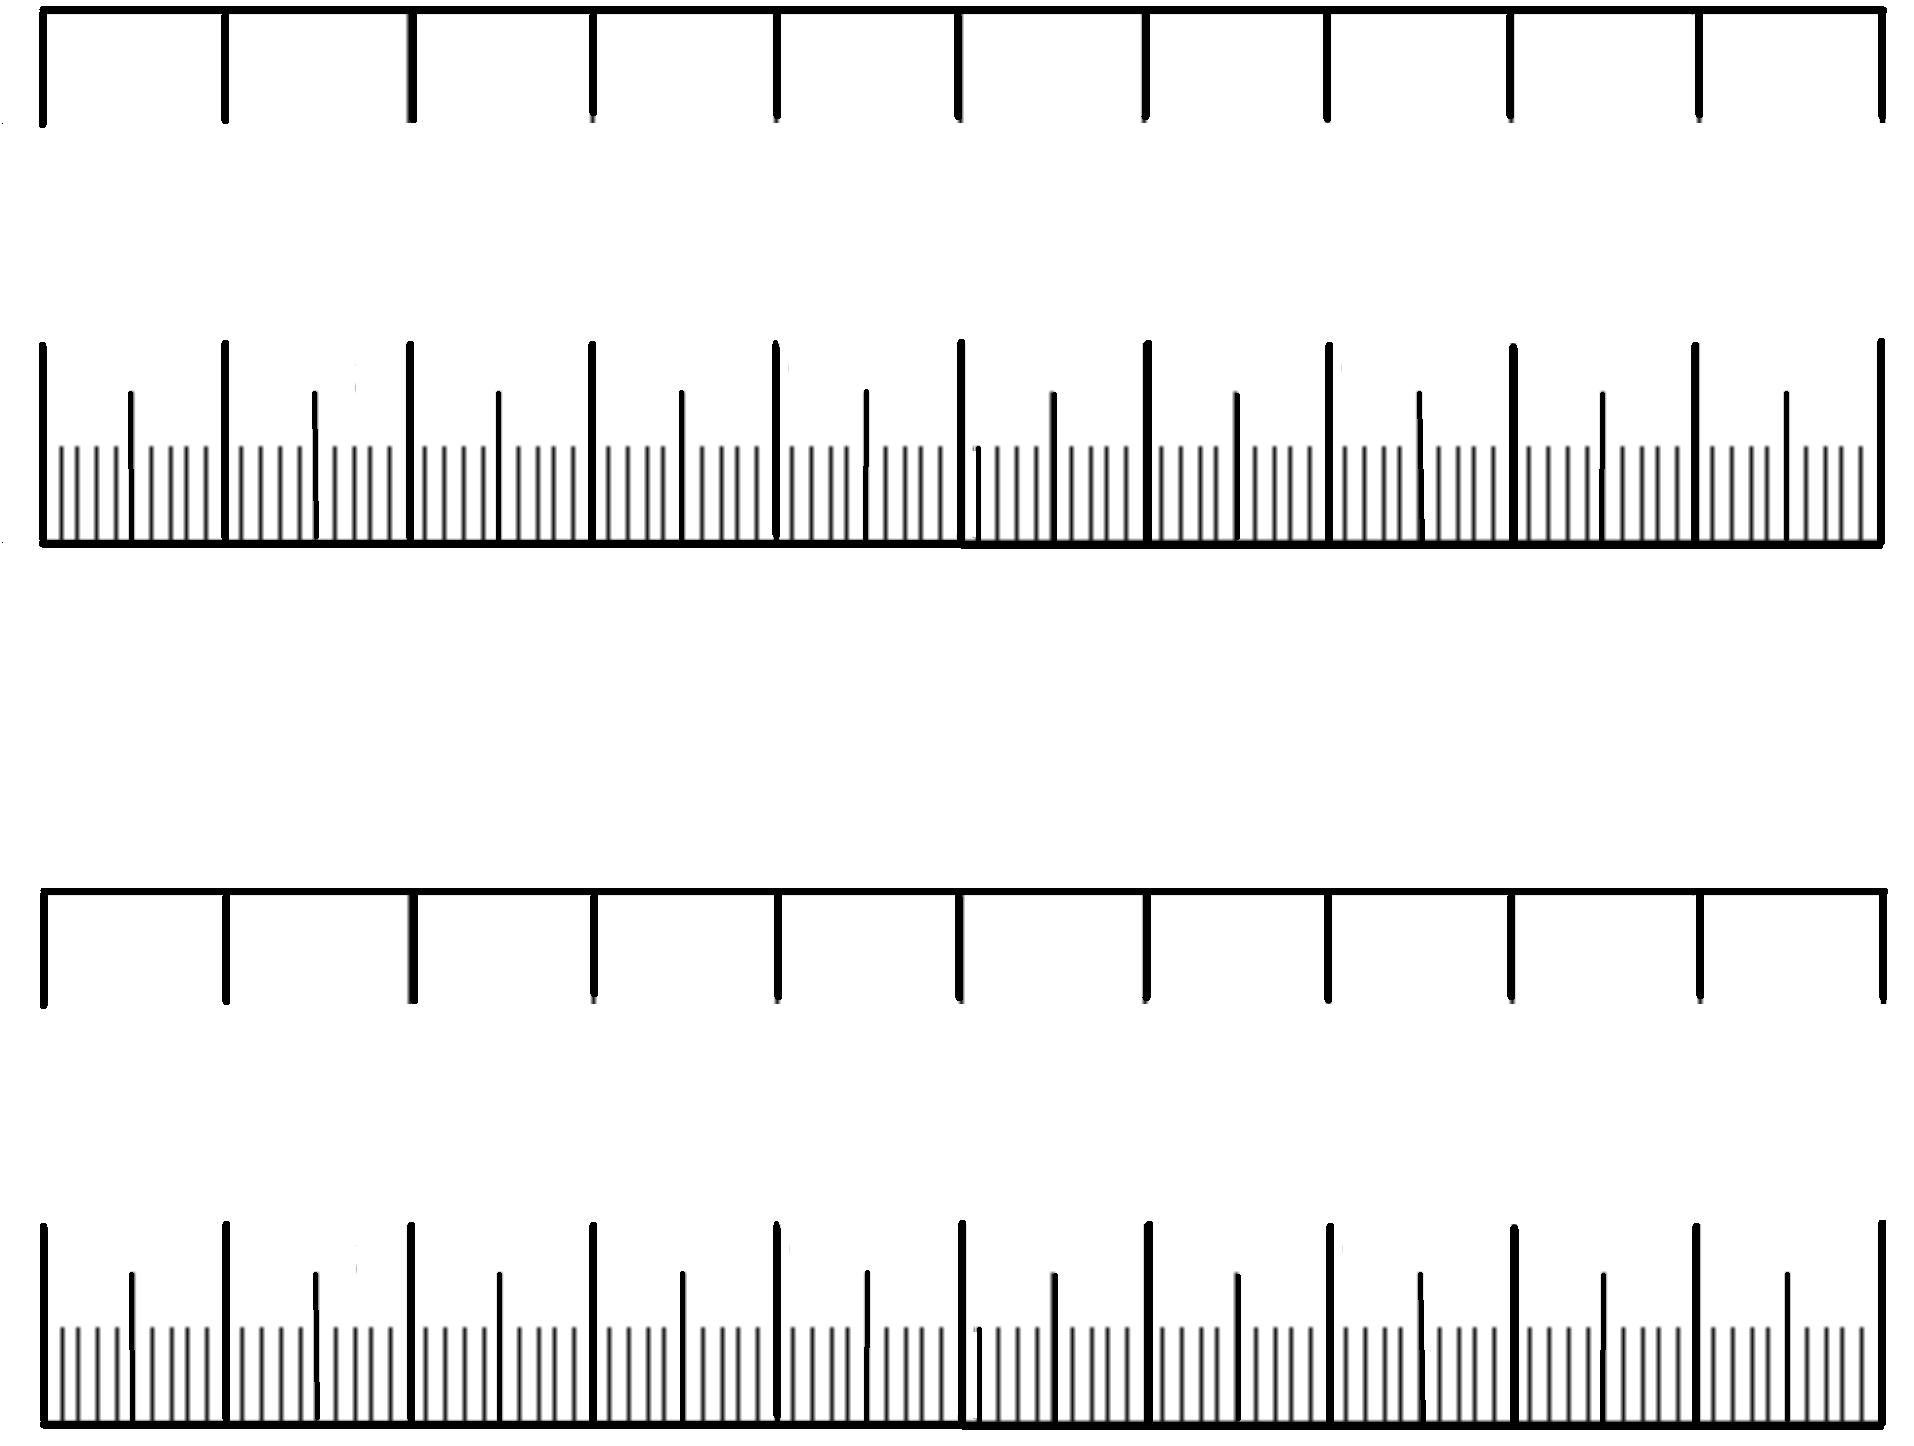 Blank decimal number lines marvelous math pinterest decimal blank decimal number lines nvjuhfo Choice Image